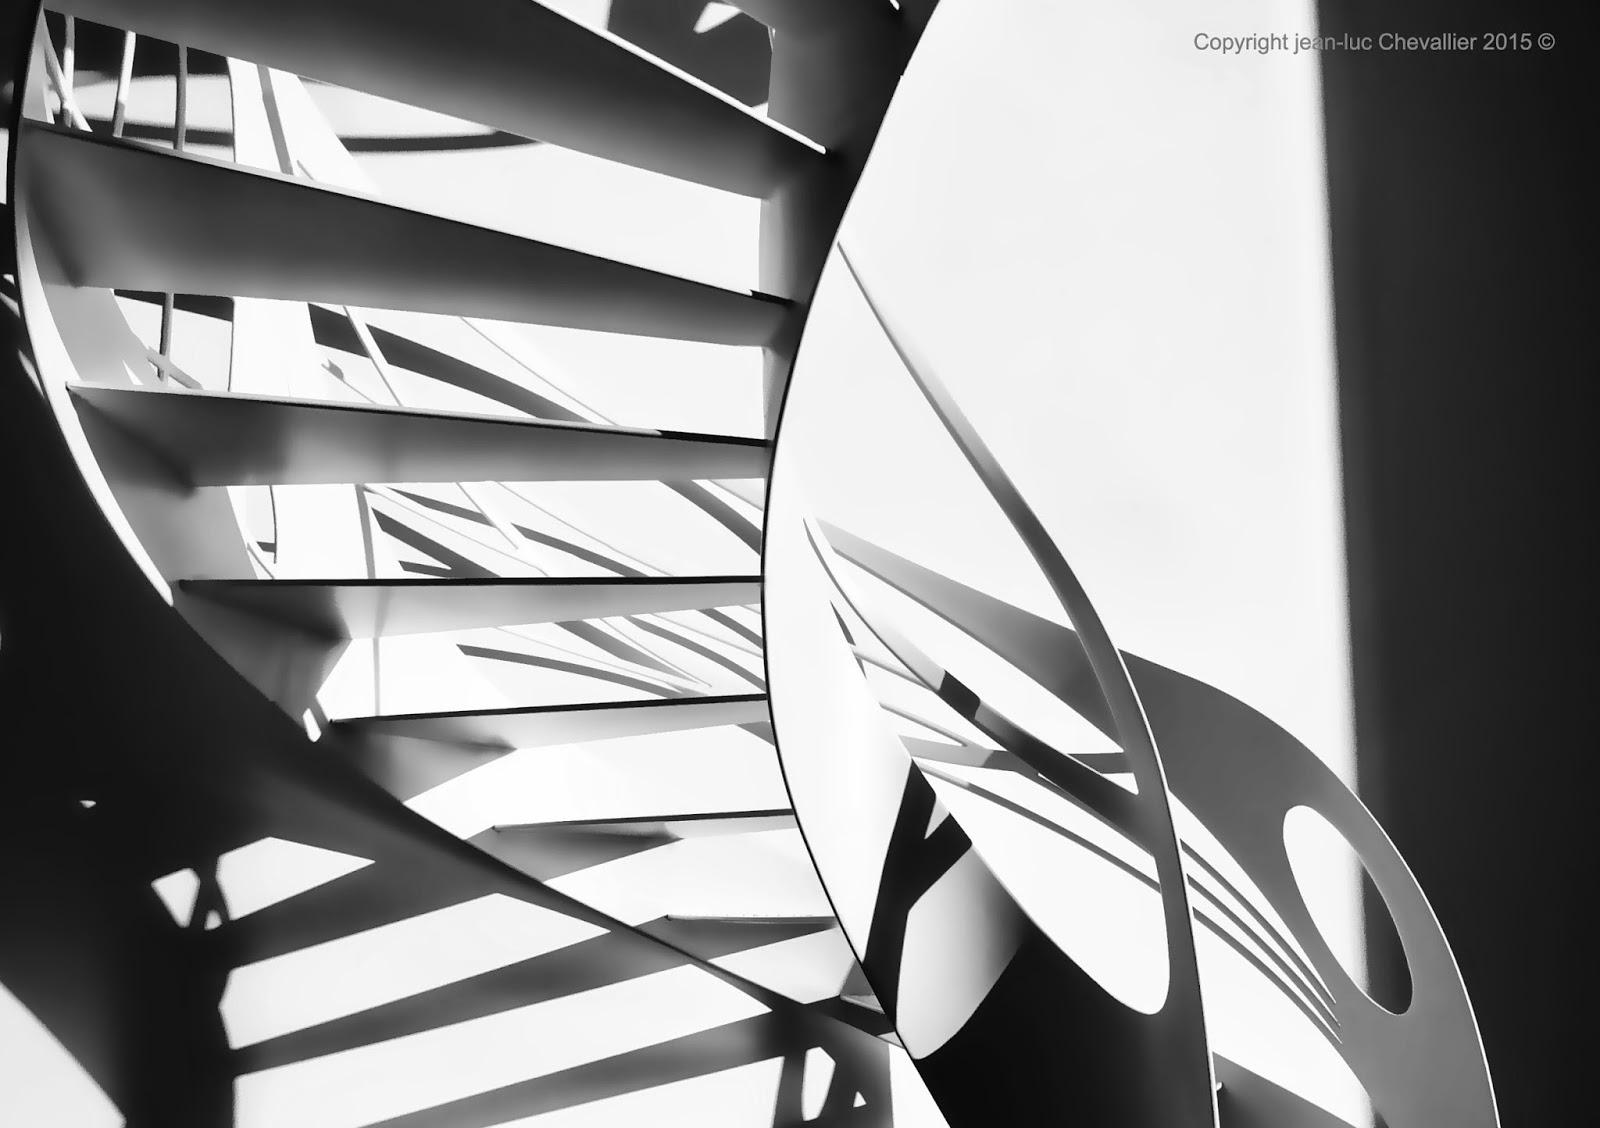 la stylique escalier design h lico dal l art du colima on. Black Bedroom Furniture Sets. Home Design Ideas